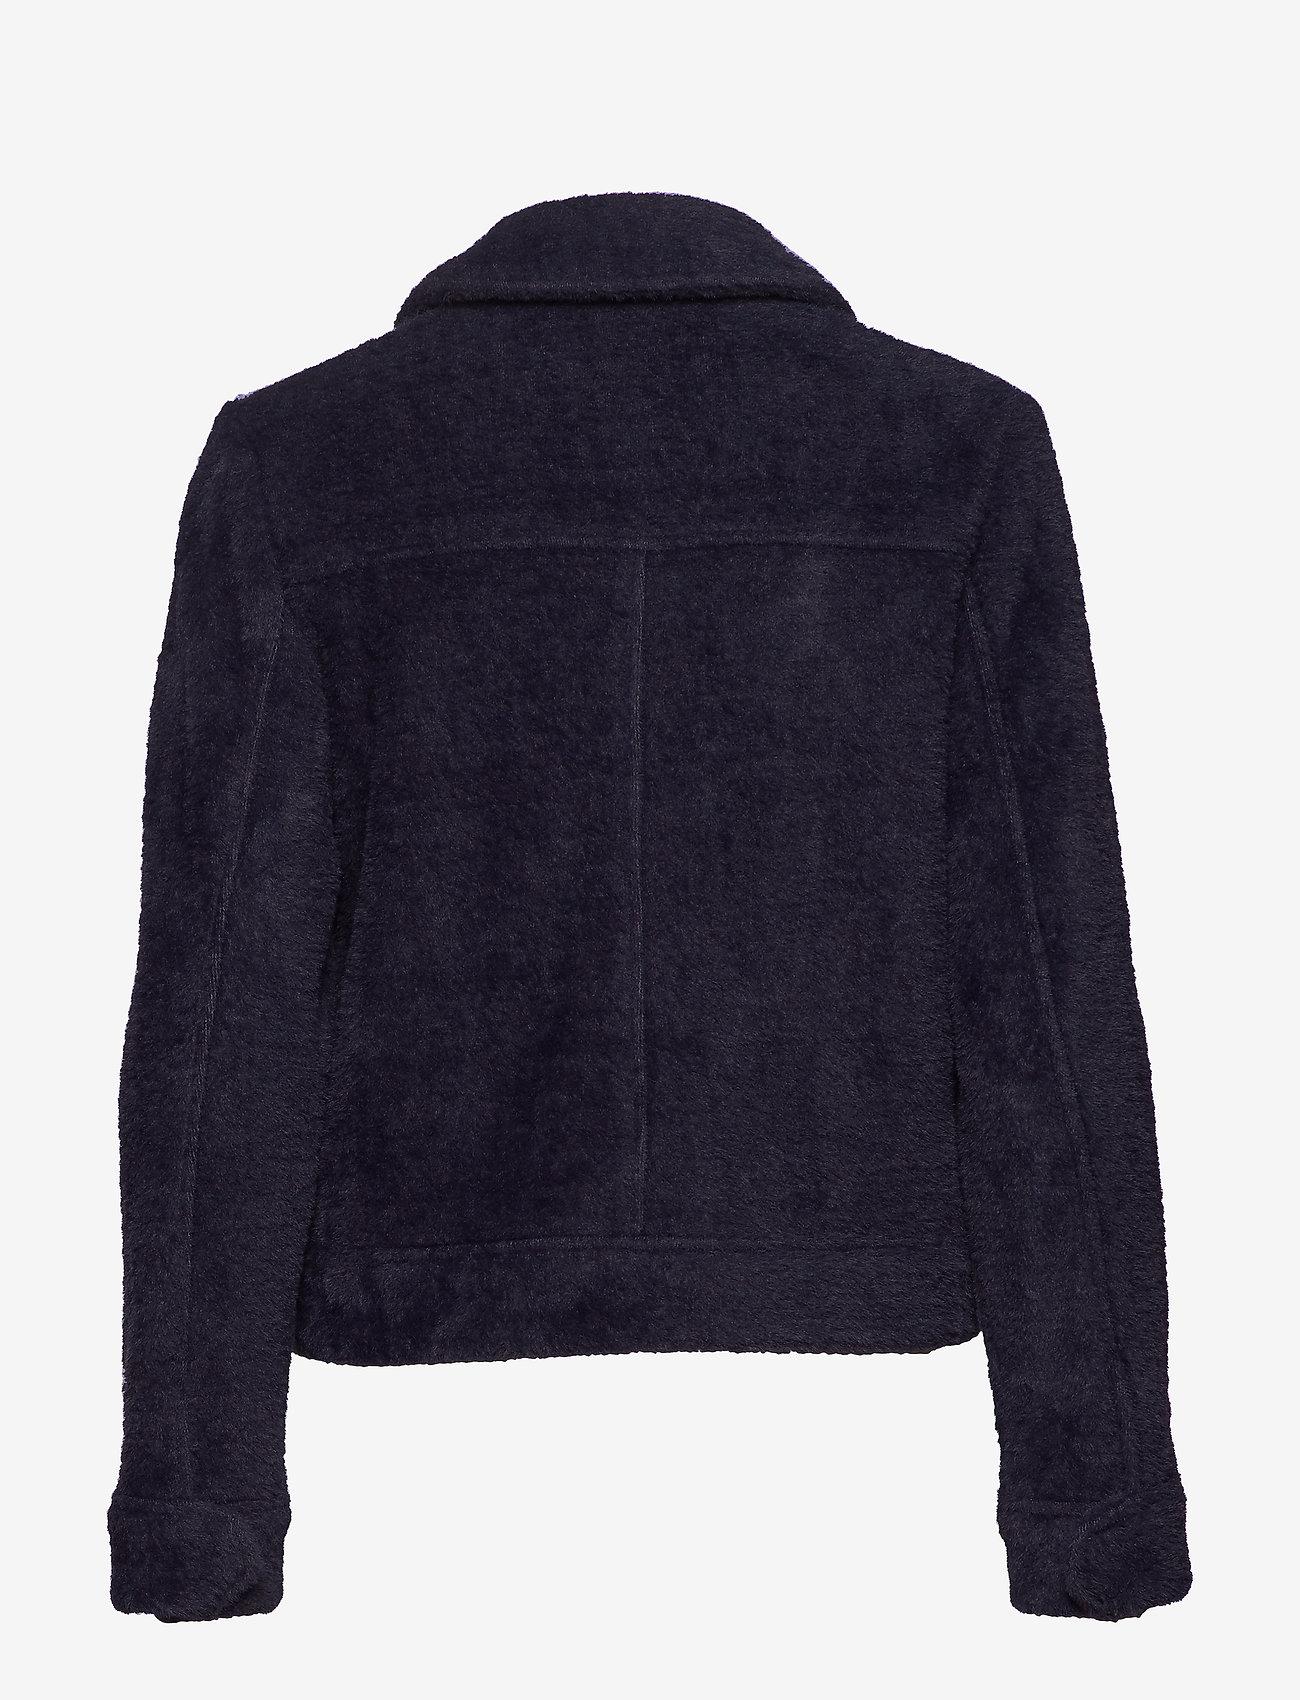 Samsøe Samsøe - Kimmy jacket 10661 - kevyet takit - dark sapphire